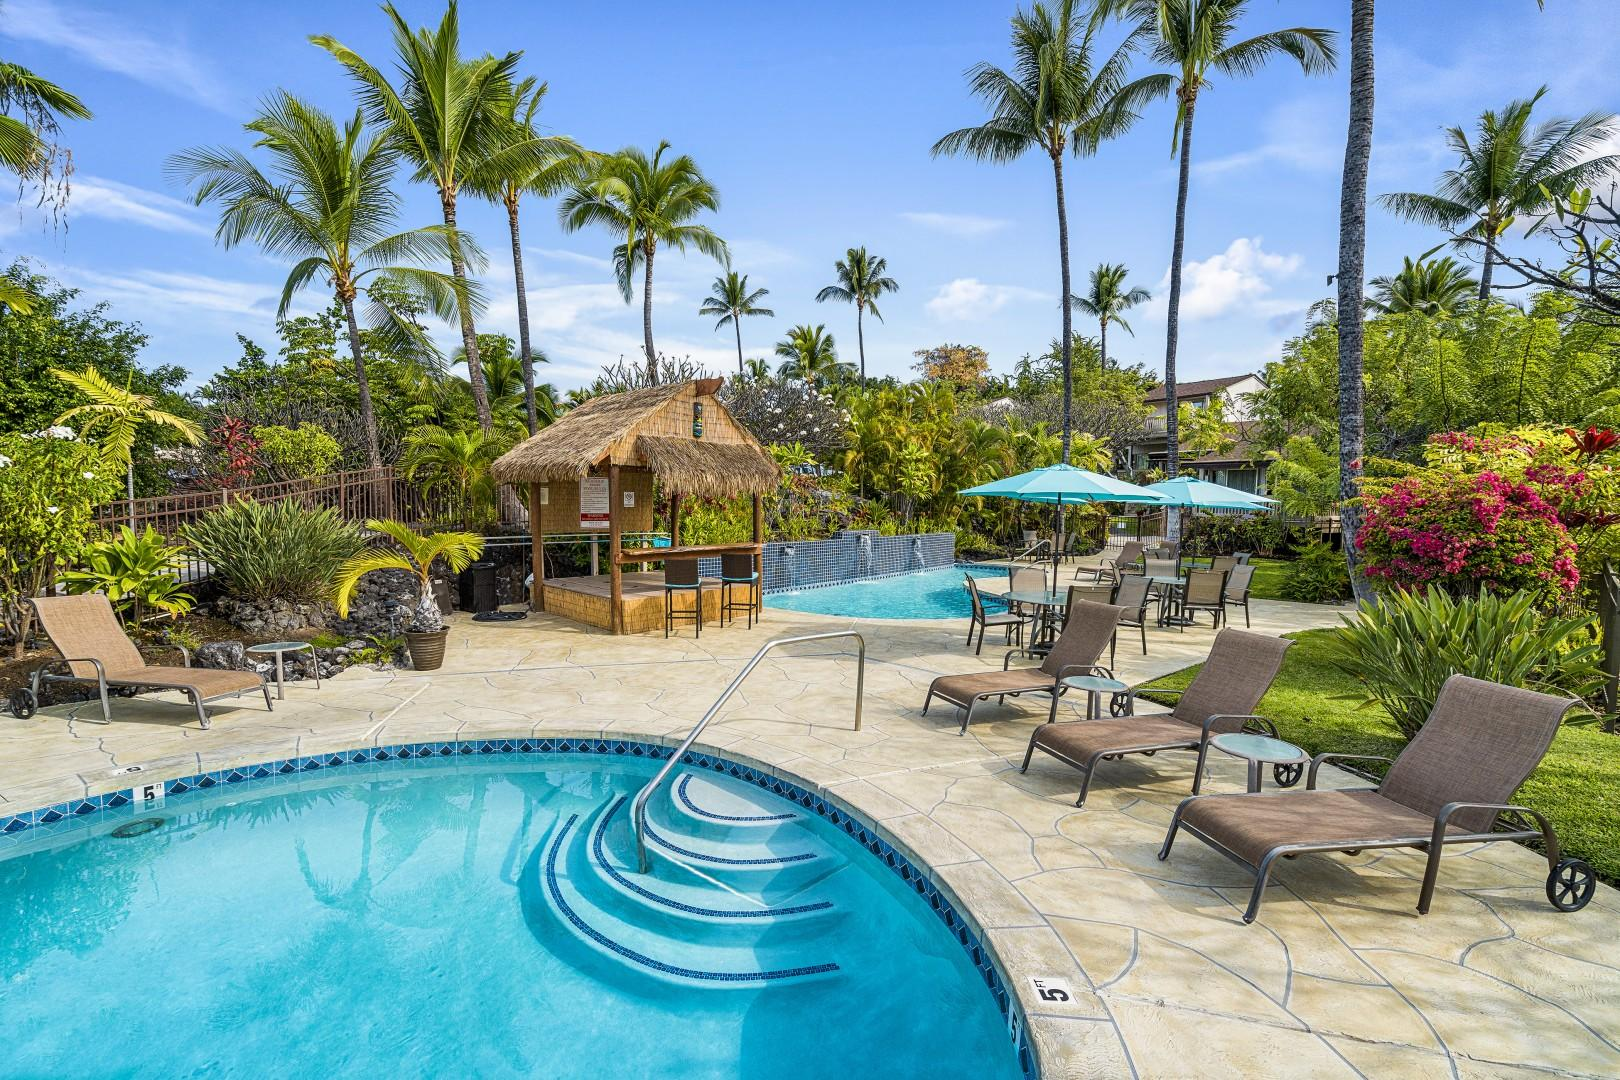 Show casing the 2 pools at Keauhou Resort!